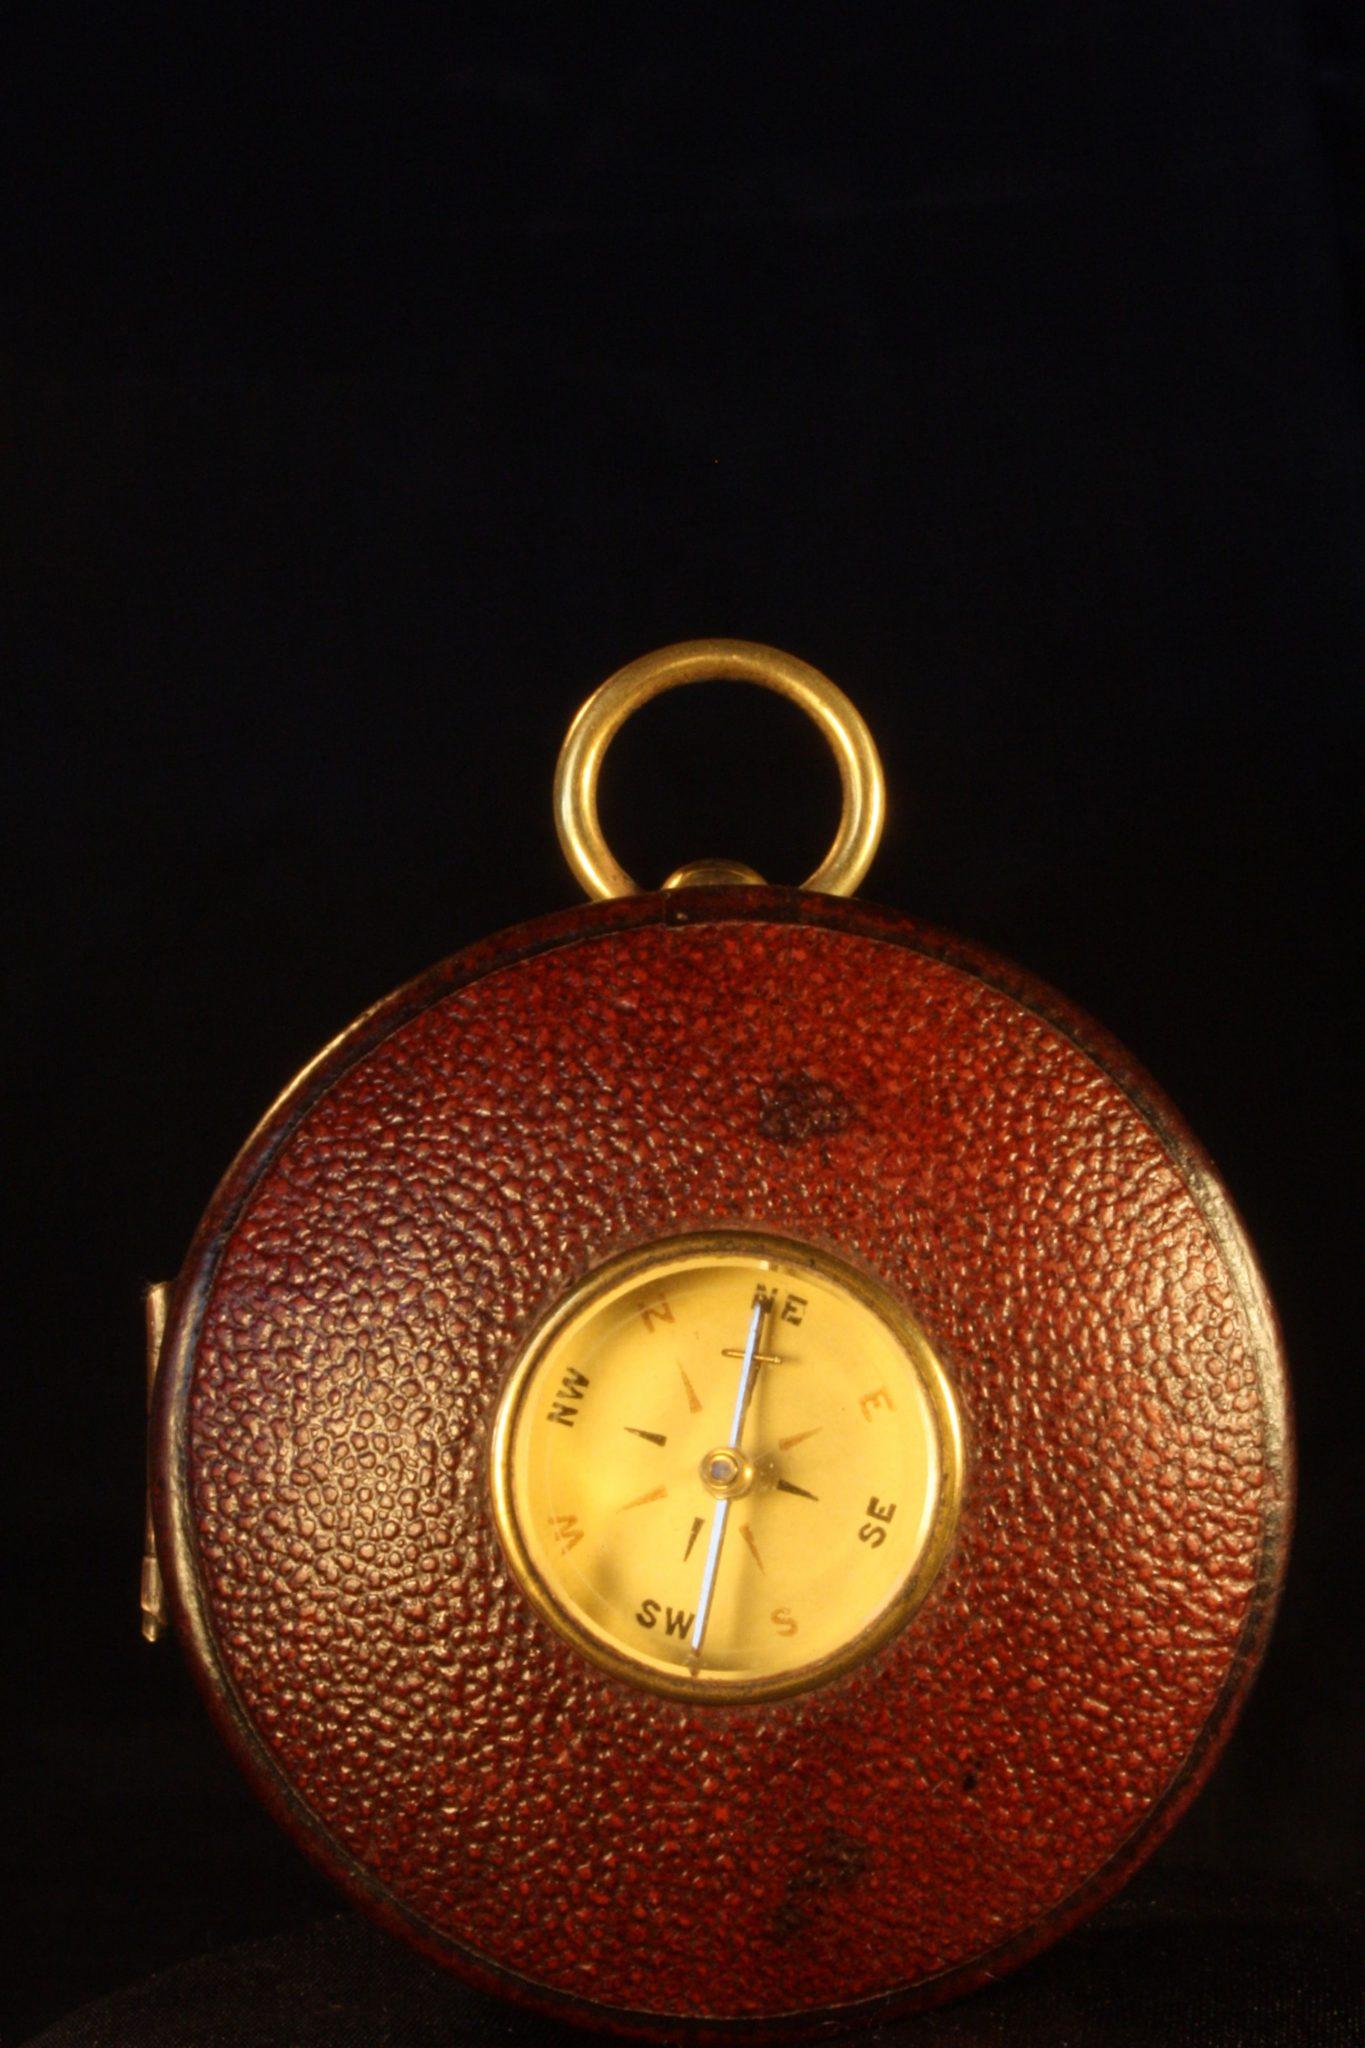 Image of Pocket Barometer Thermometer Compass Compendium by Negretti & Zambra